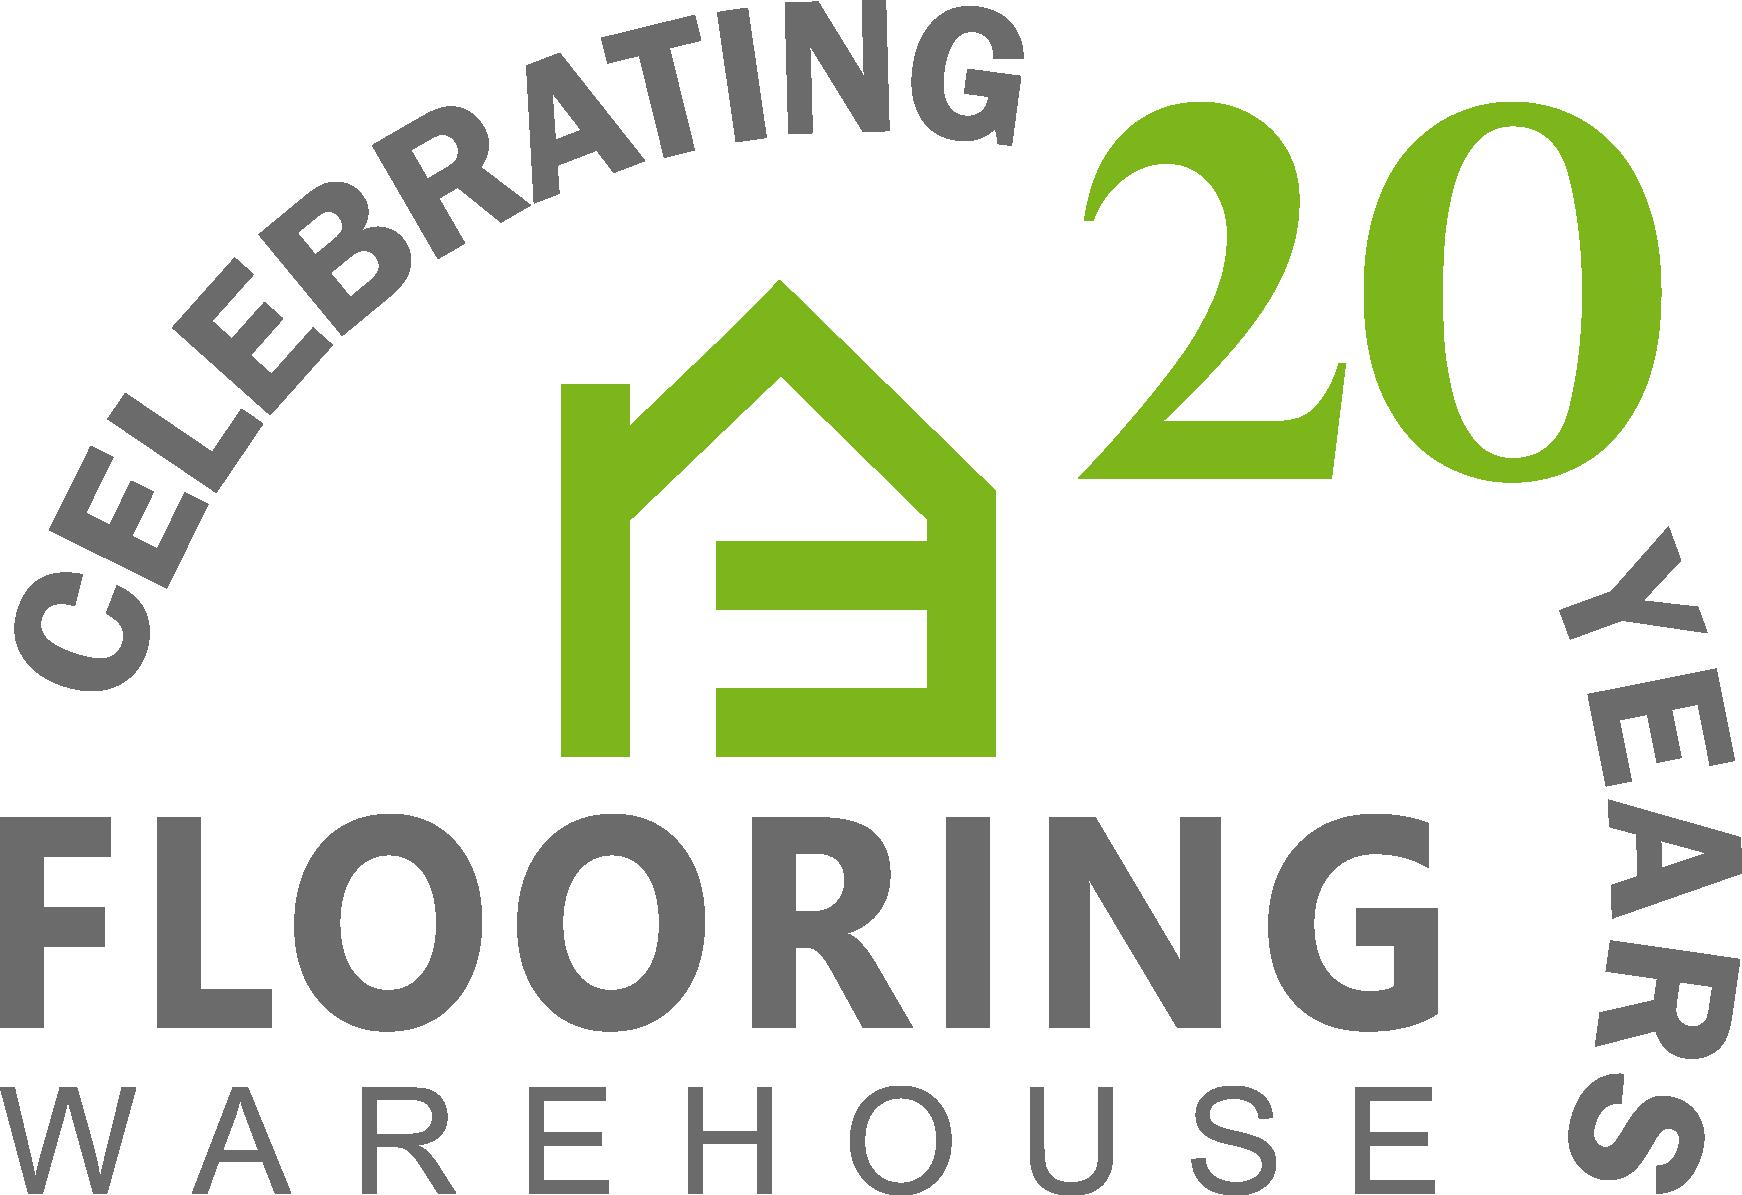 Austin Flooring - Flooring Warehouse Logo